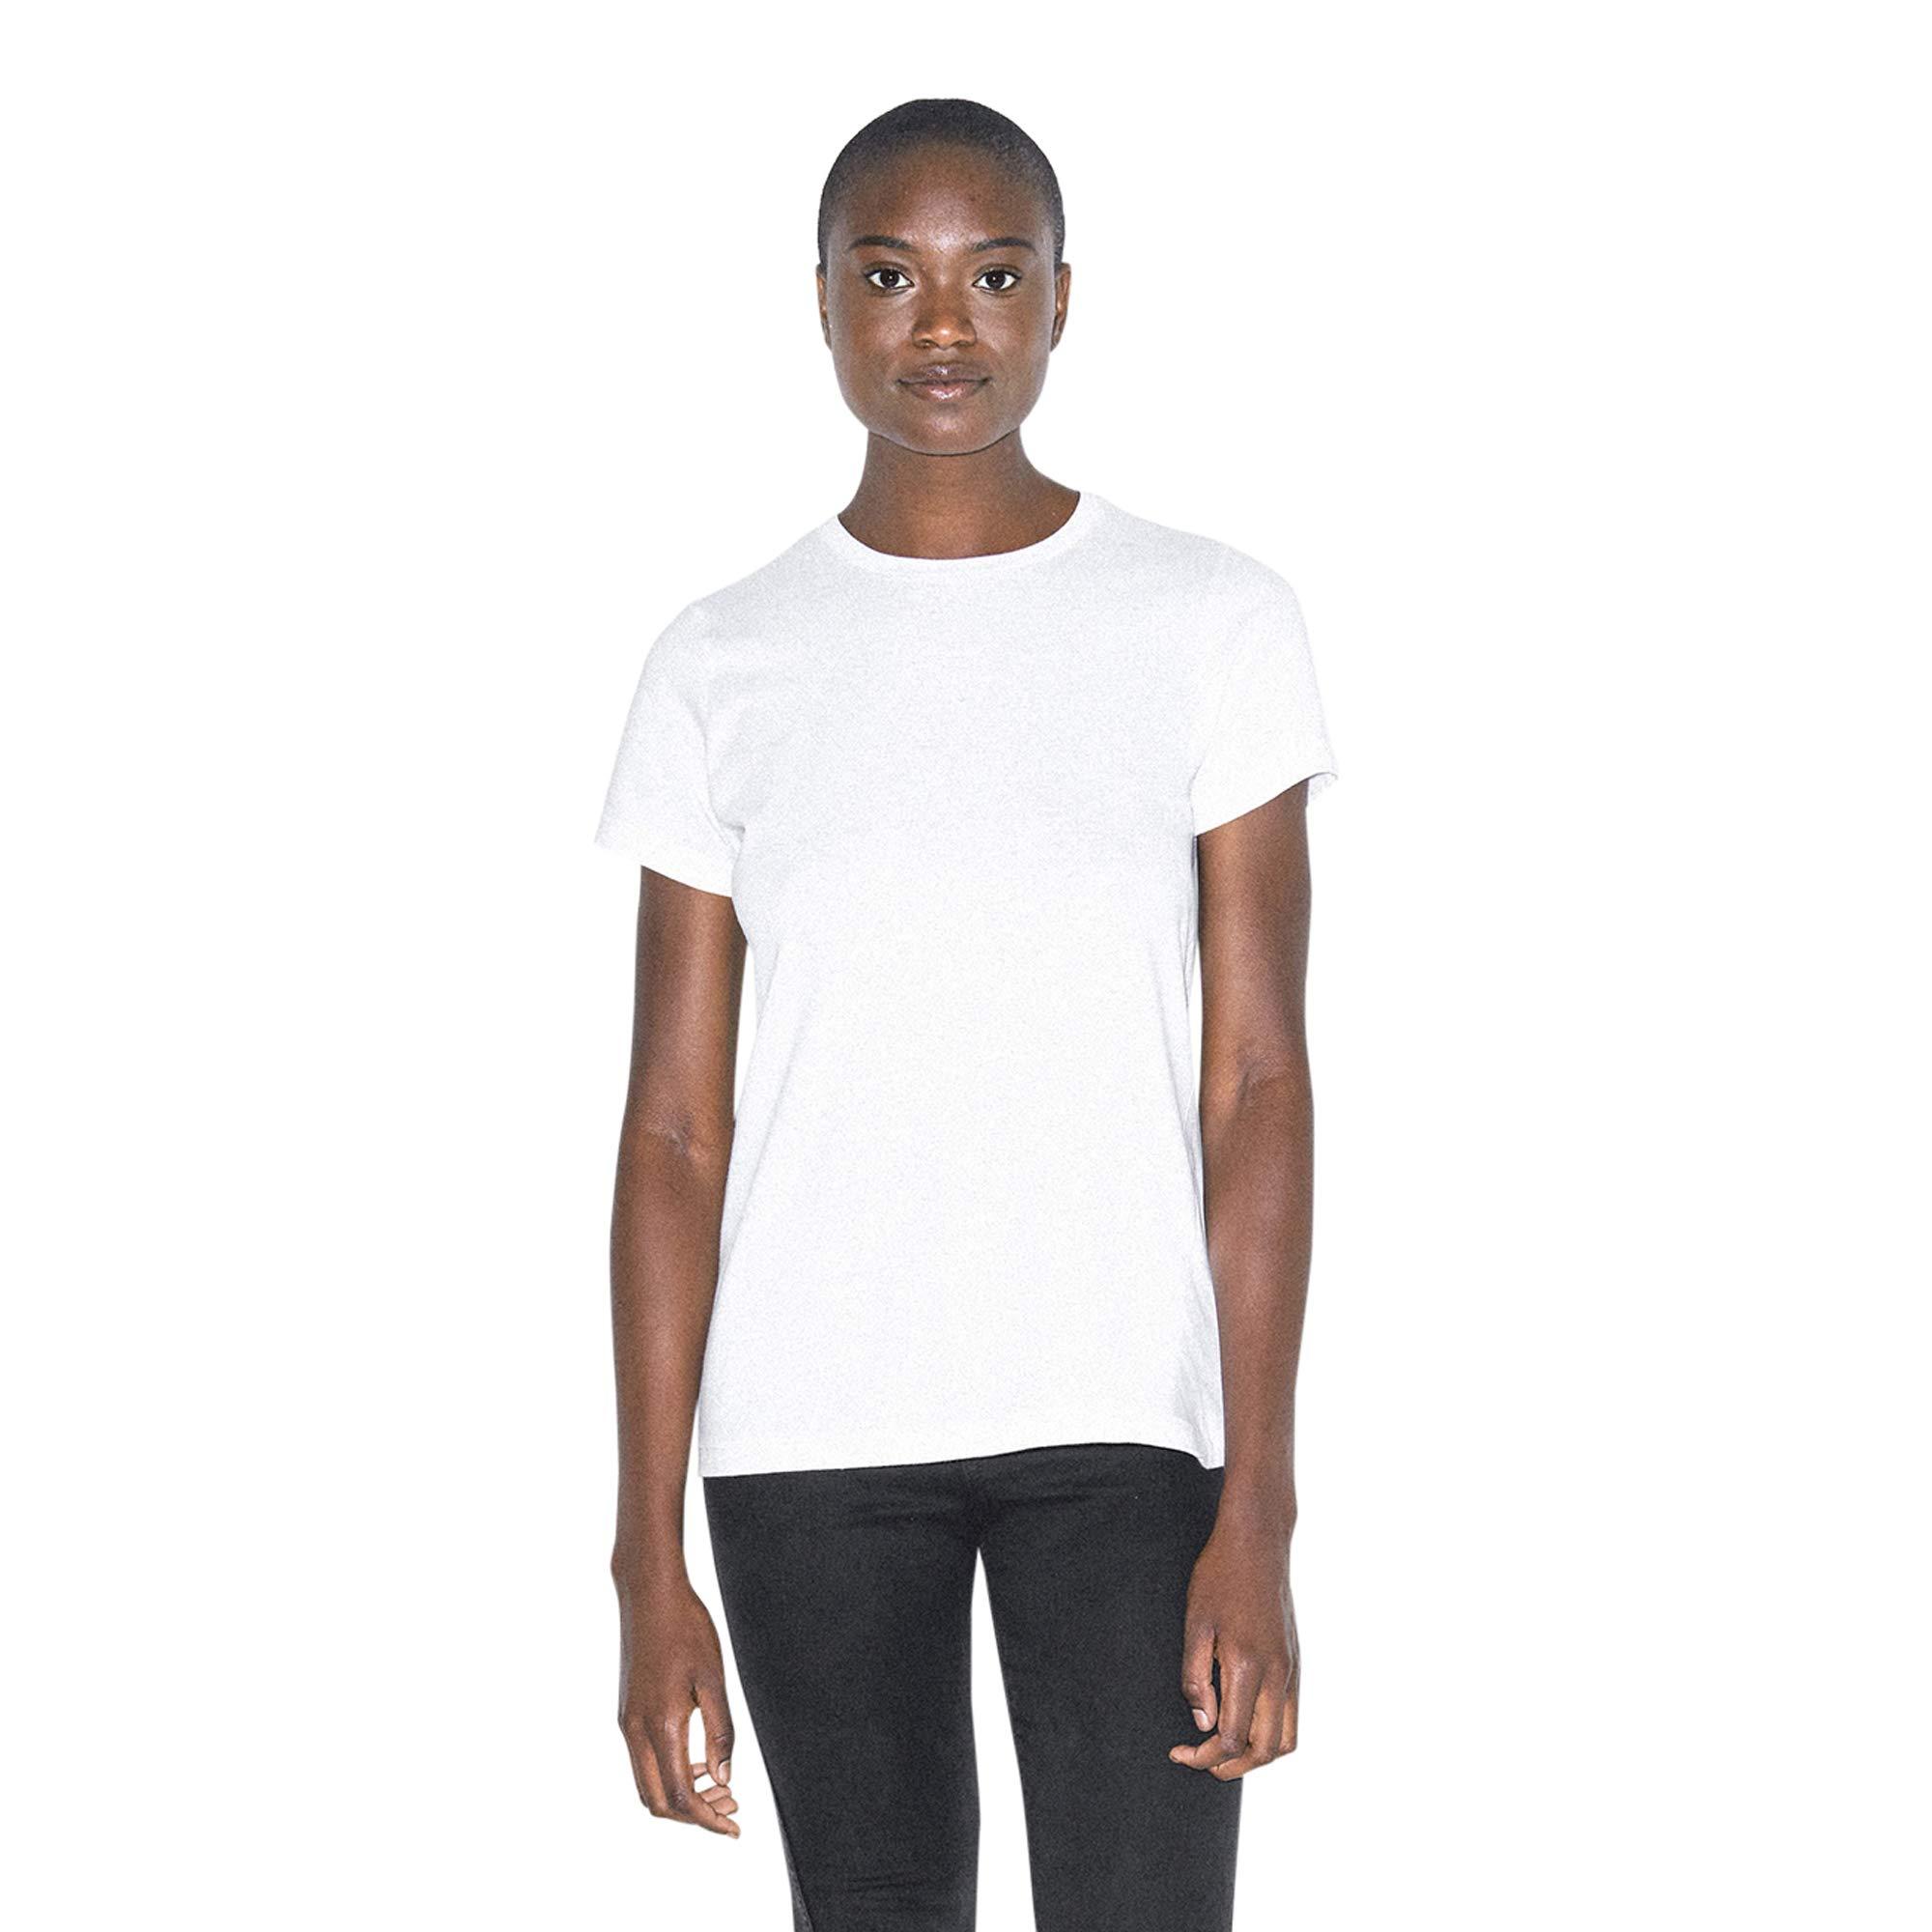 American Apparel Women's Organic Fine Jersey Classic Crewneck Short Sleeve T-Shirt